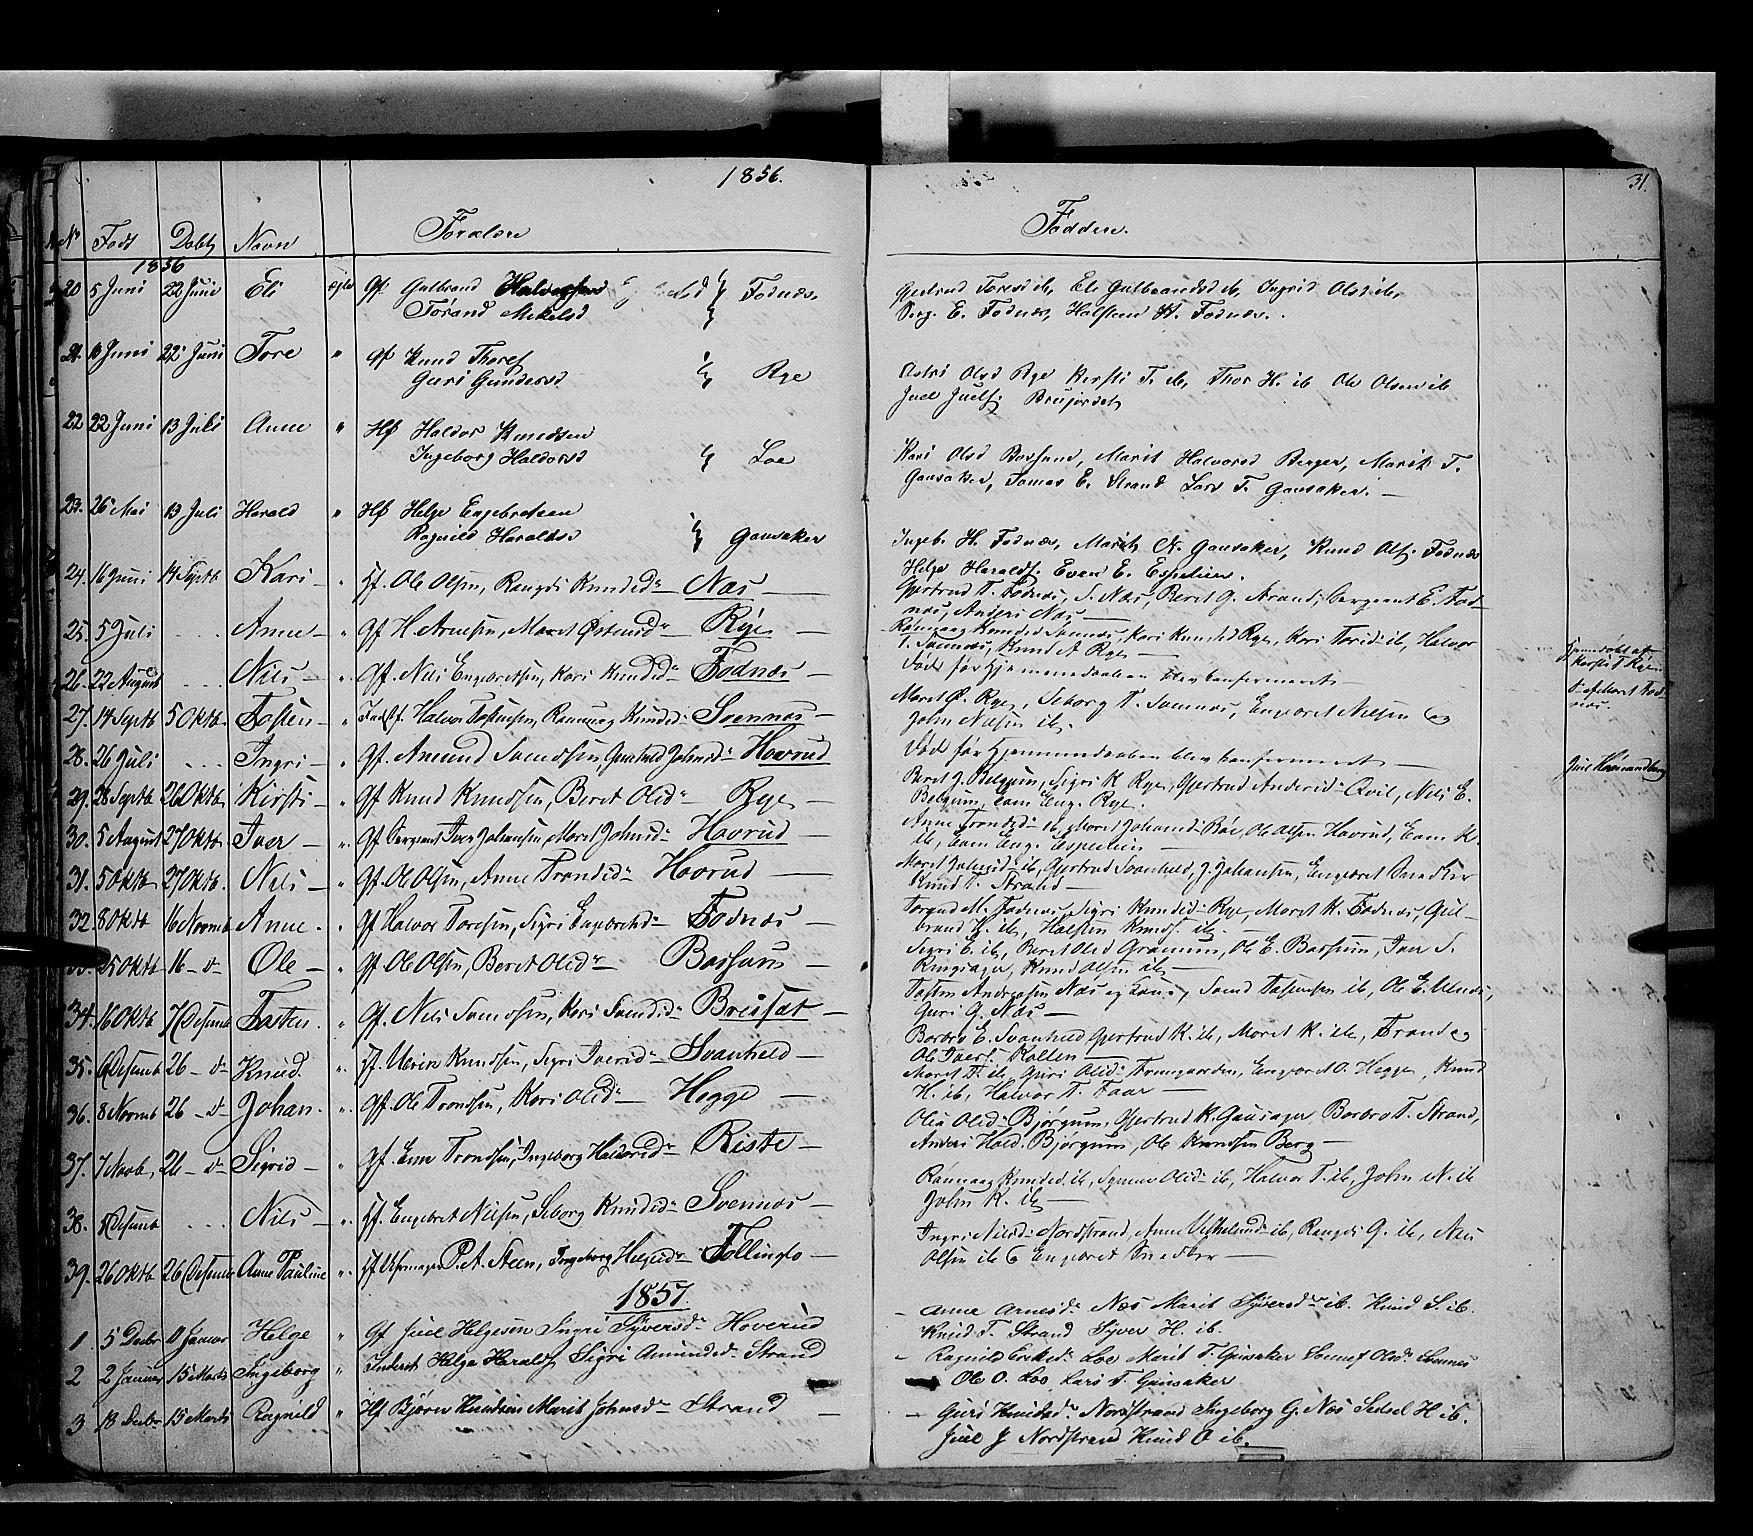 SAH, Nord-Aurdal prestekontor, Ministerialbok nr. 5, 1842-1863, s. 31